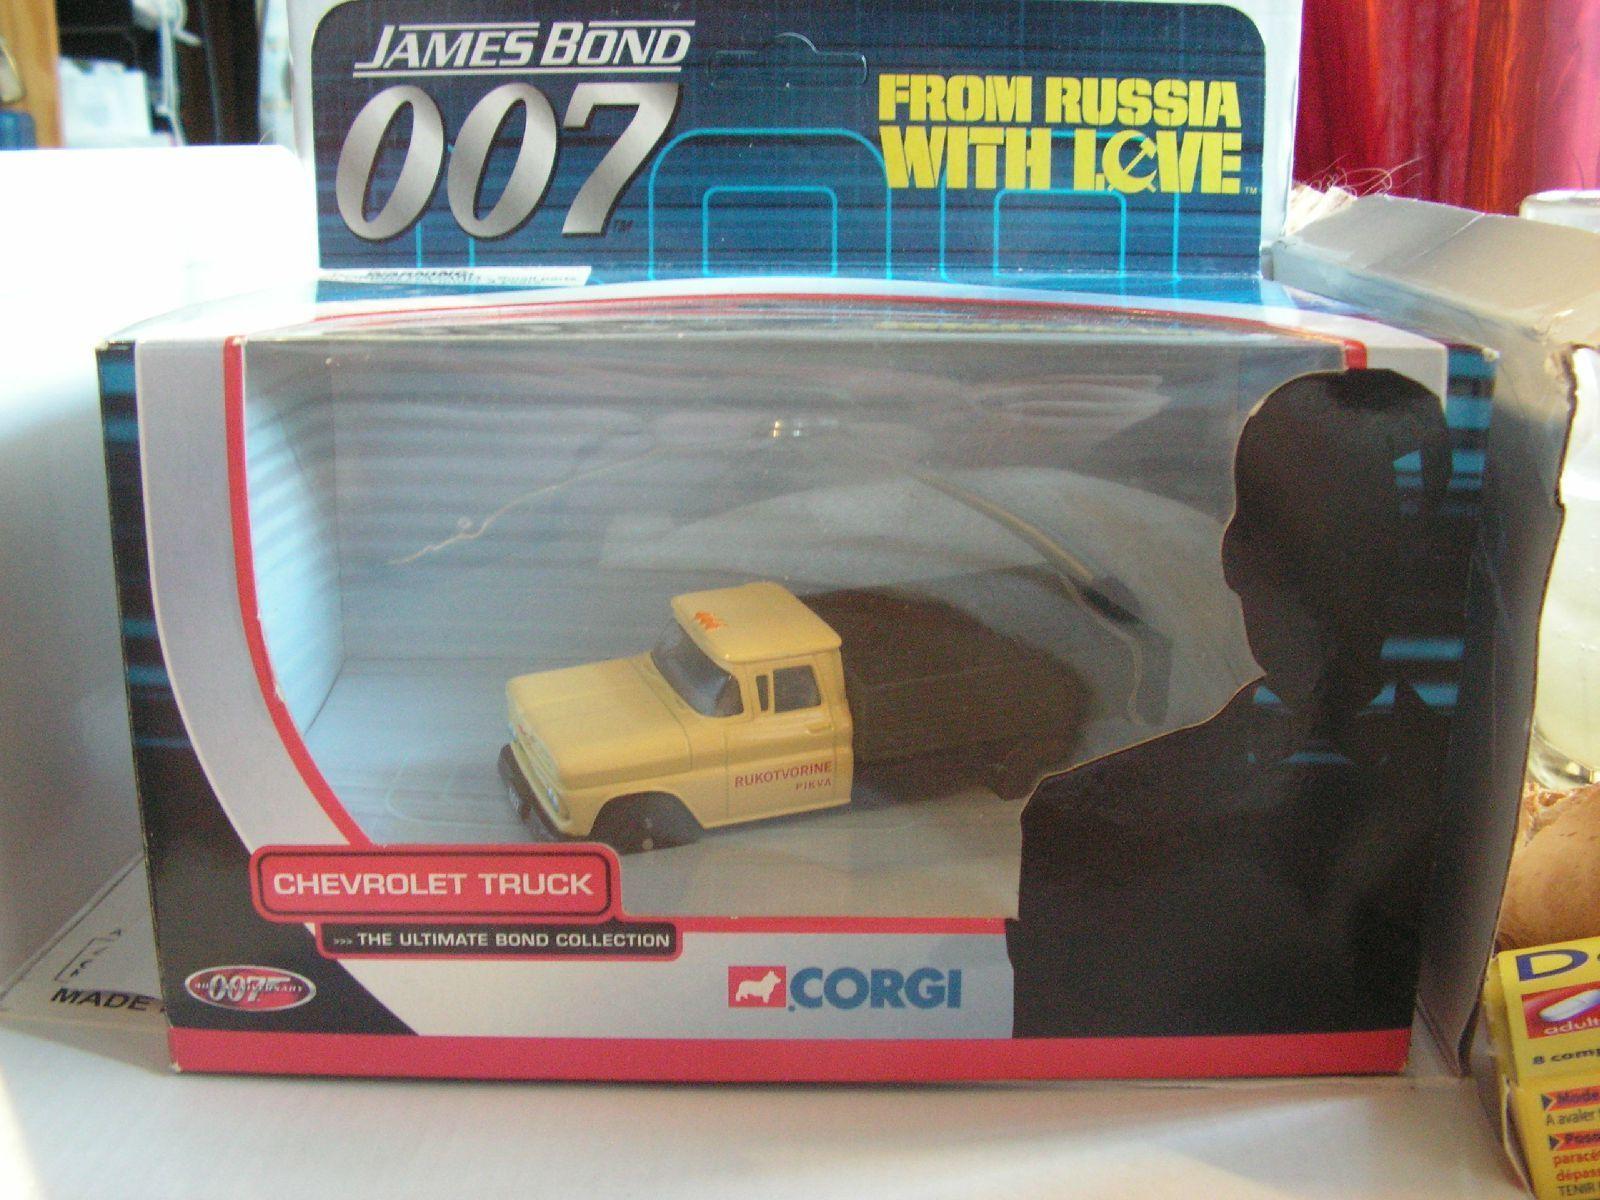 007 JAMES BOND  FROM RUSSIA WITH LOVE BON BAISER DE RUSSIE CHERVOLET 1 43 CORGI